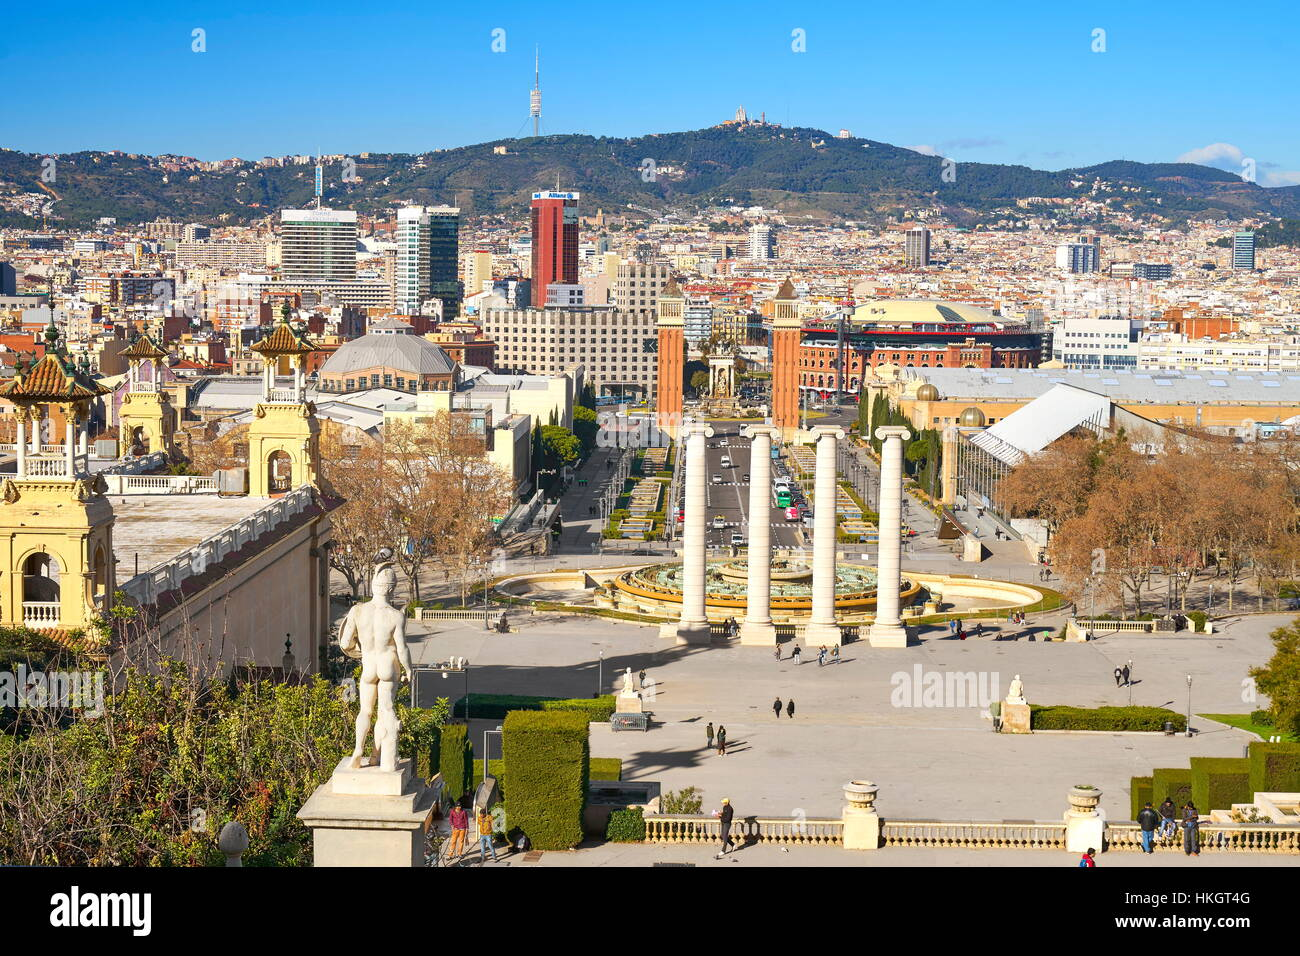 Placa De Espanya, Square of Spain, Barcelona, Catalonia, Spain - Stock Image